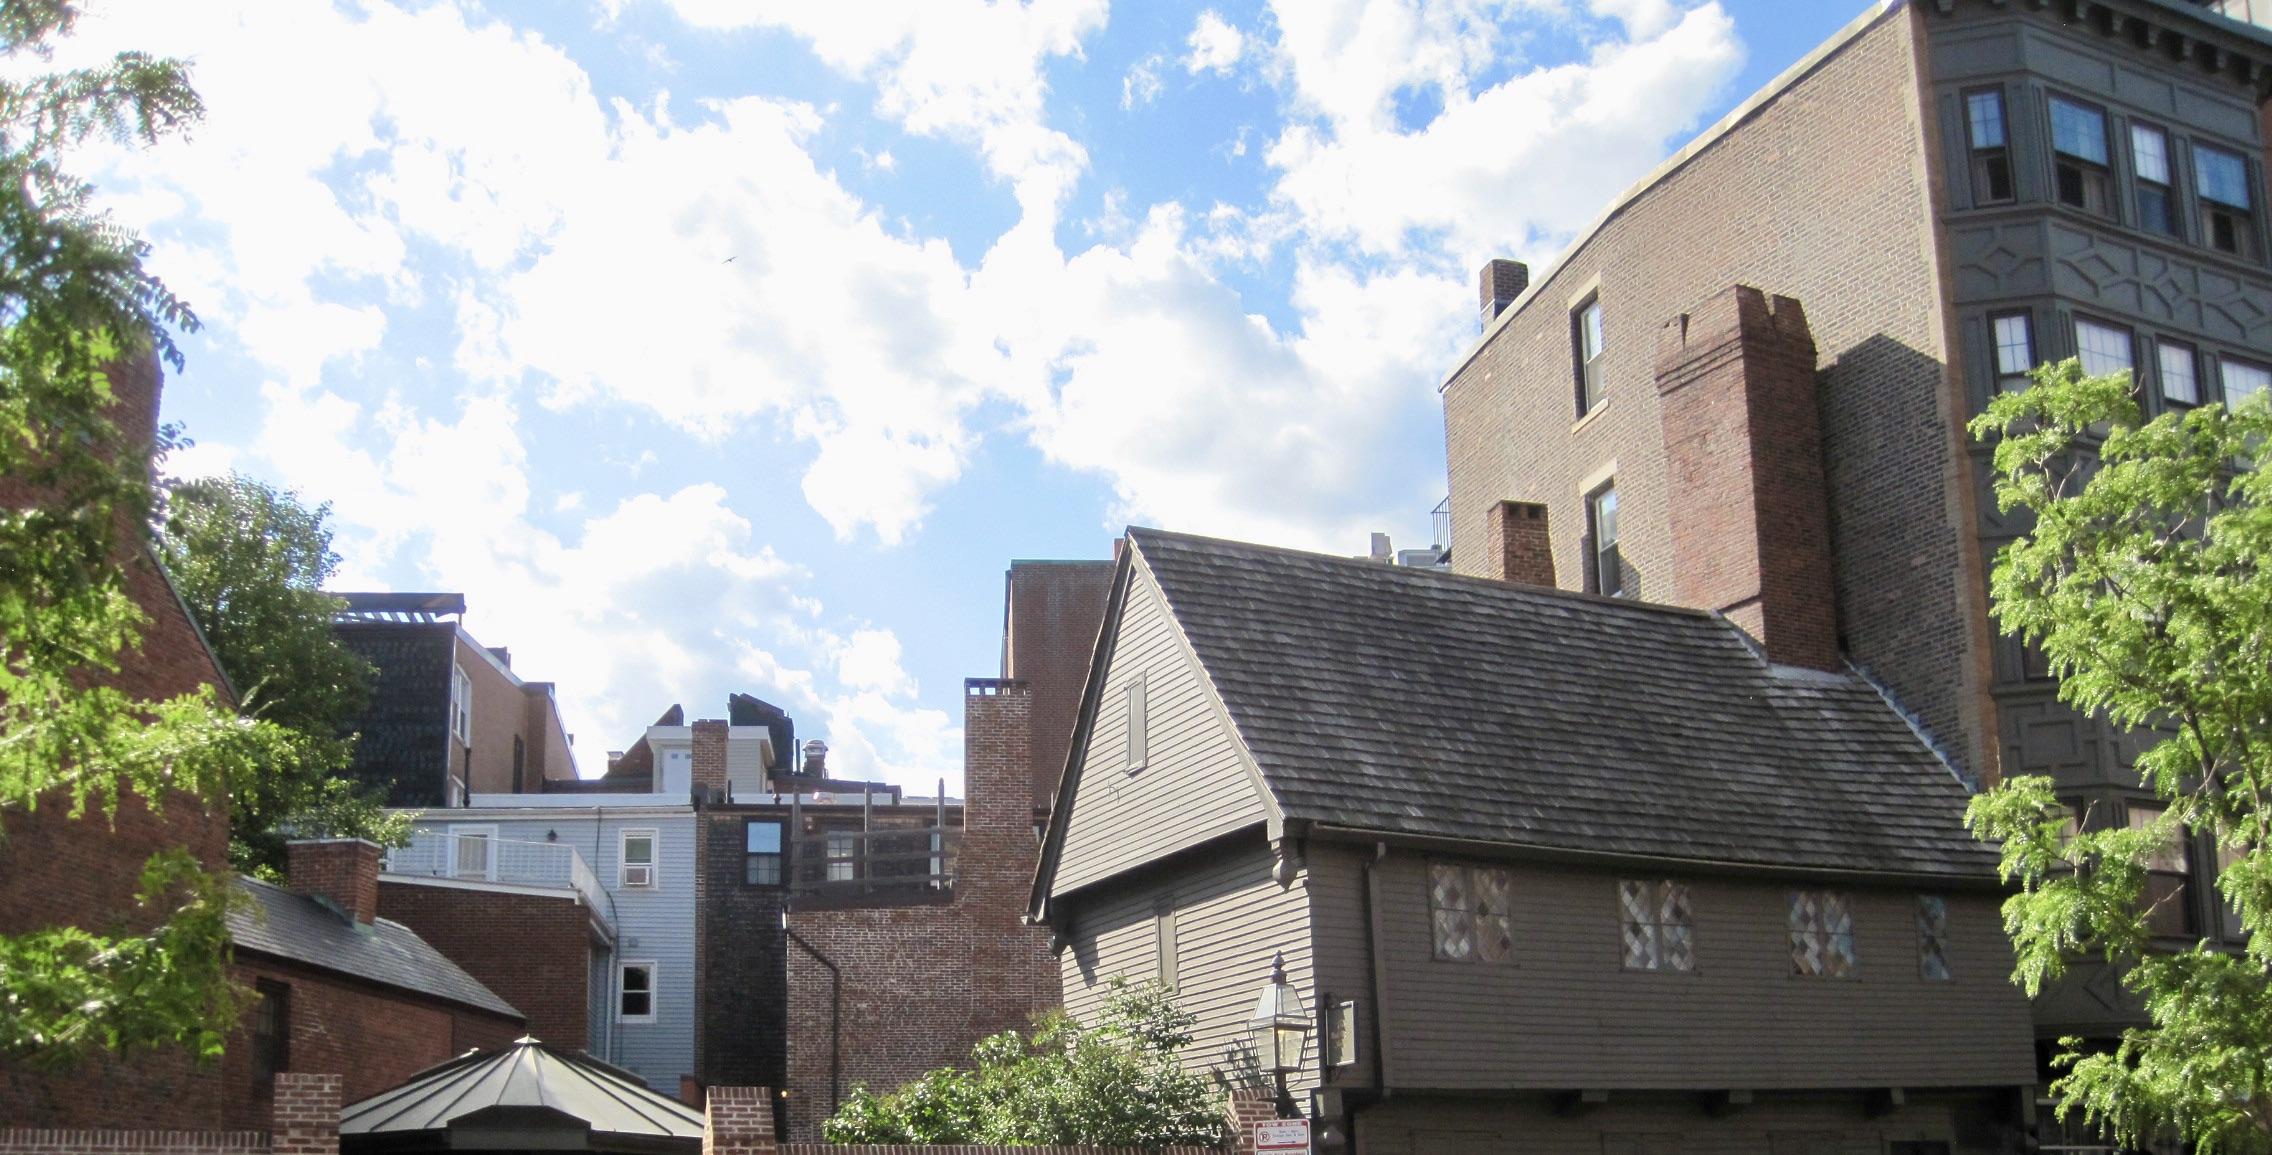 The Paul Revere House in Boston, MA